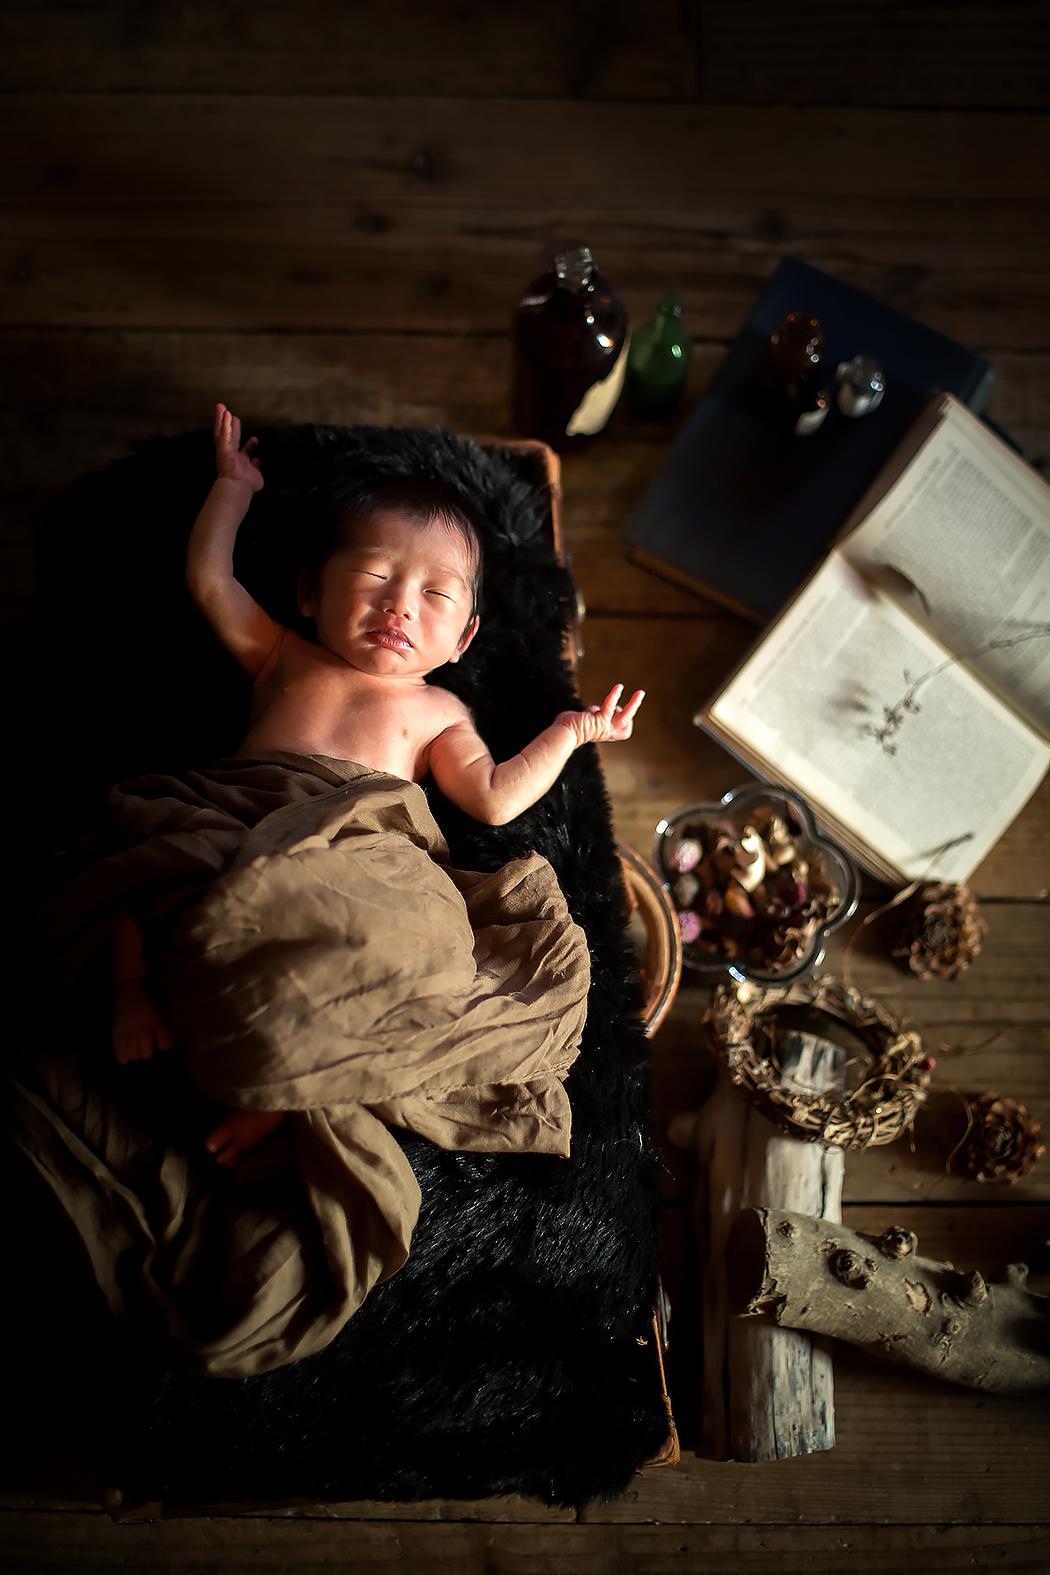 NewBorn,新生児,赤ちゃん,ニューボーン